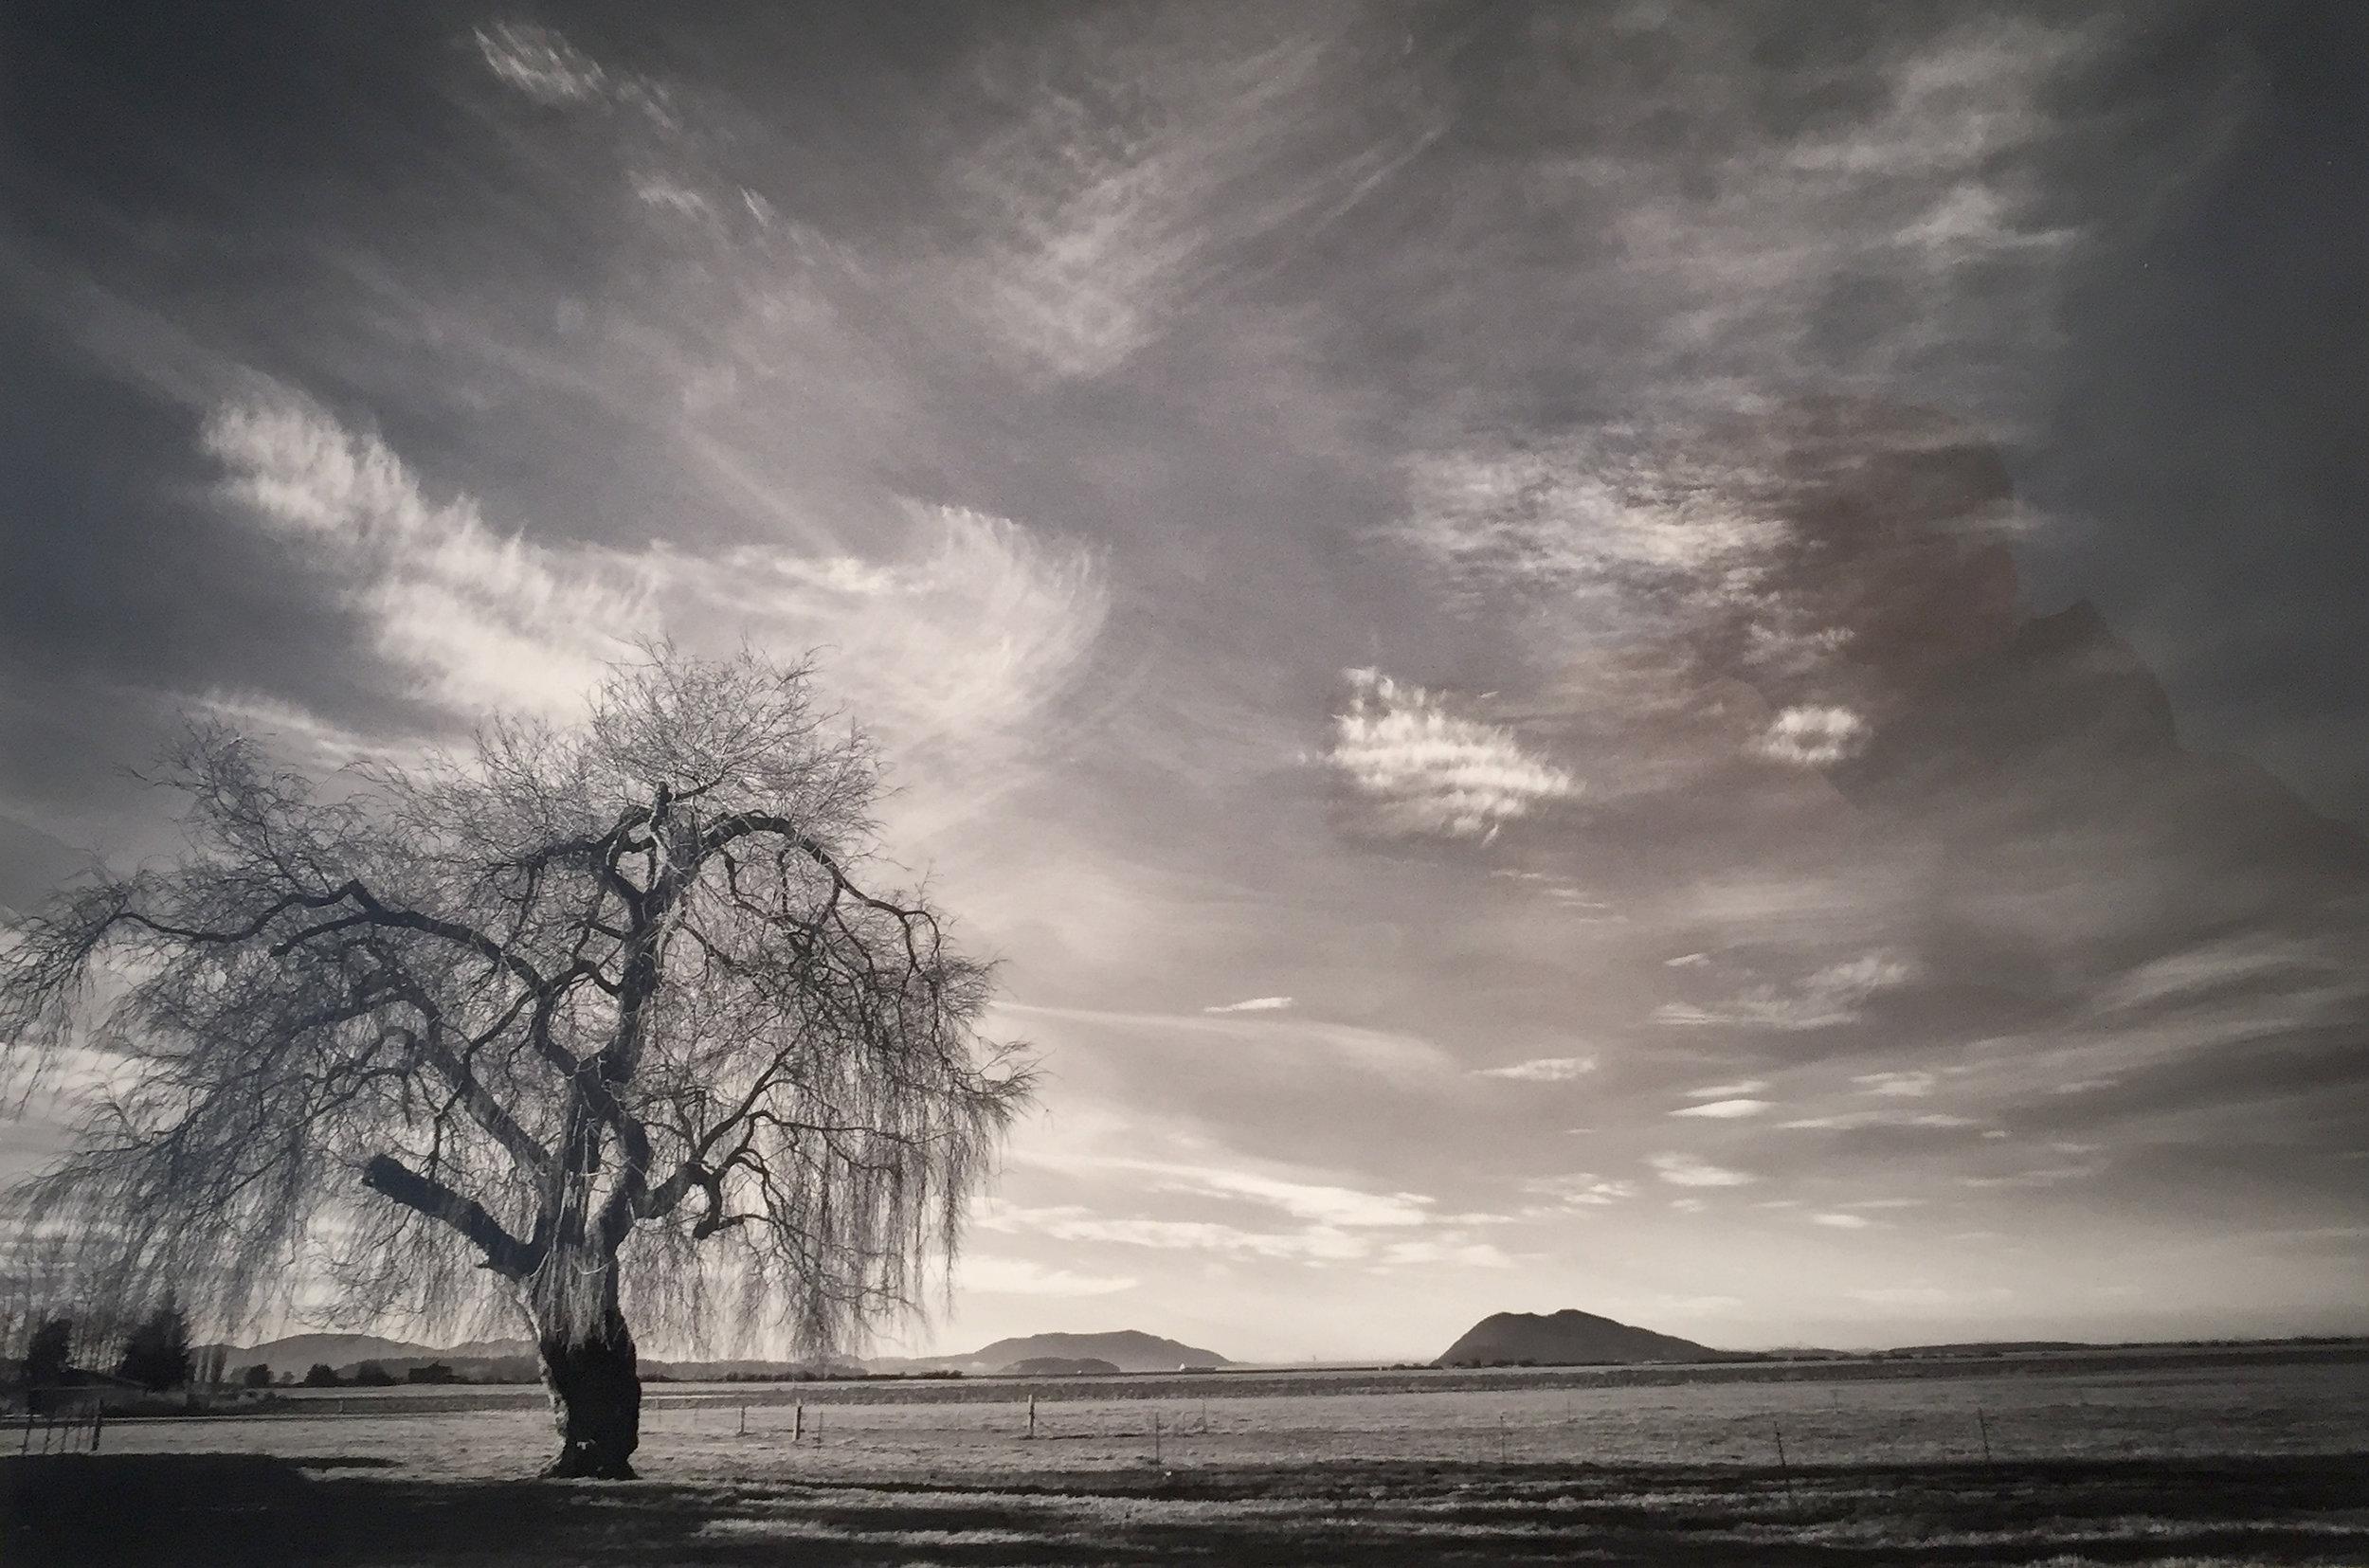 Tree + Landscape Edison, WA  Phil Eidenberg-Noppe copy.jpg